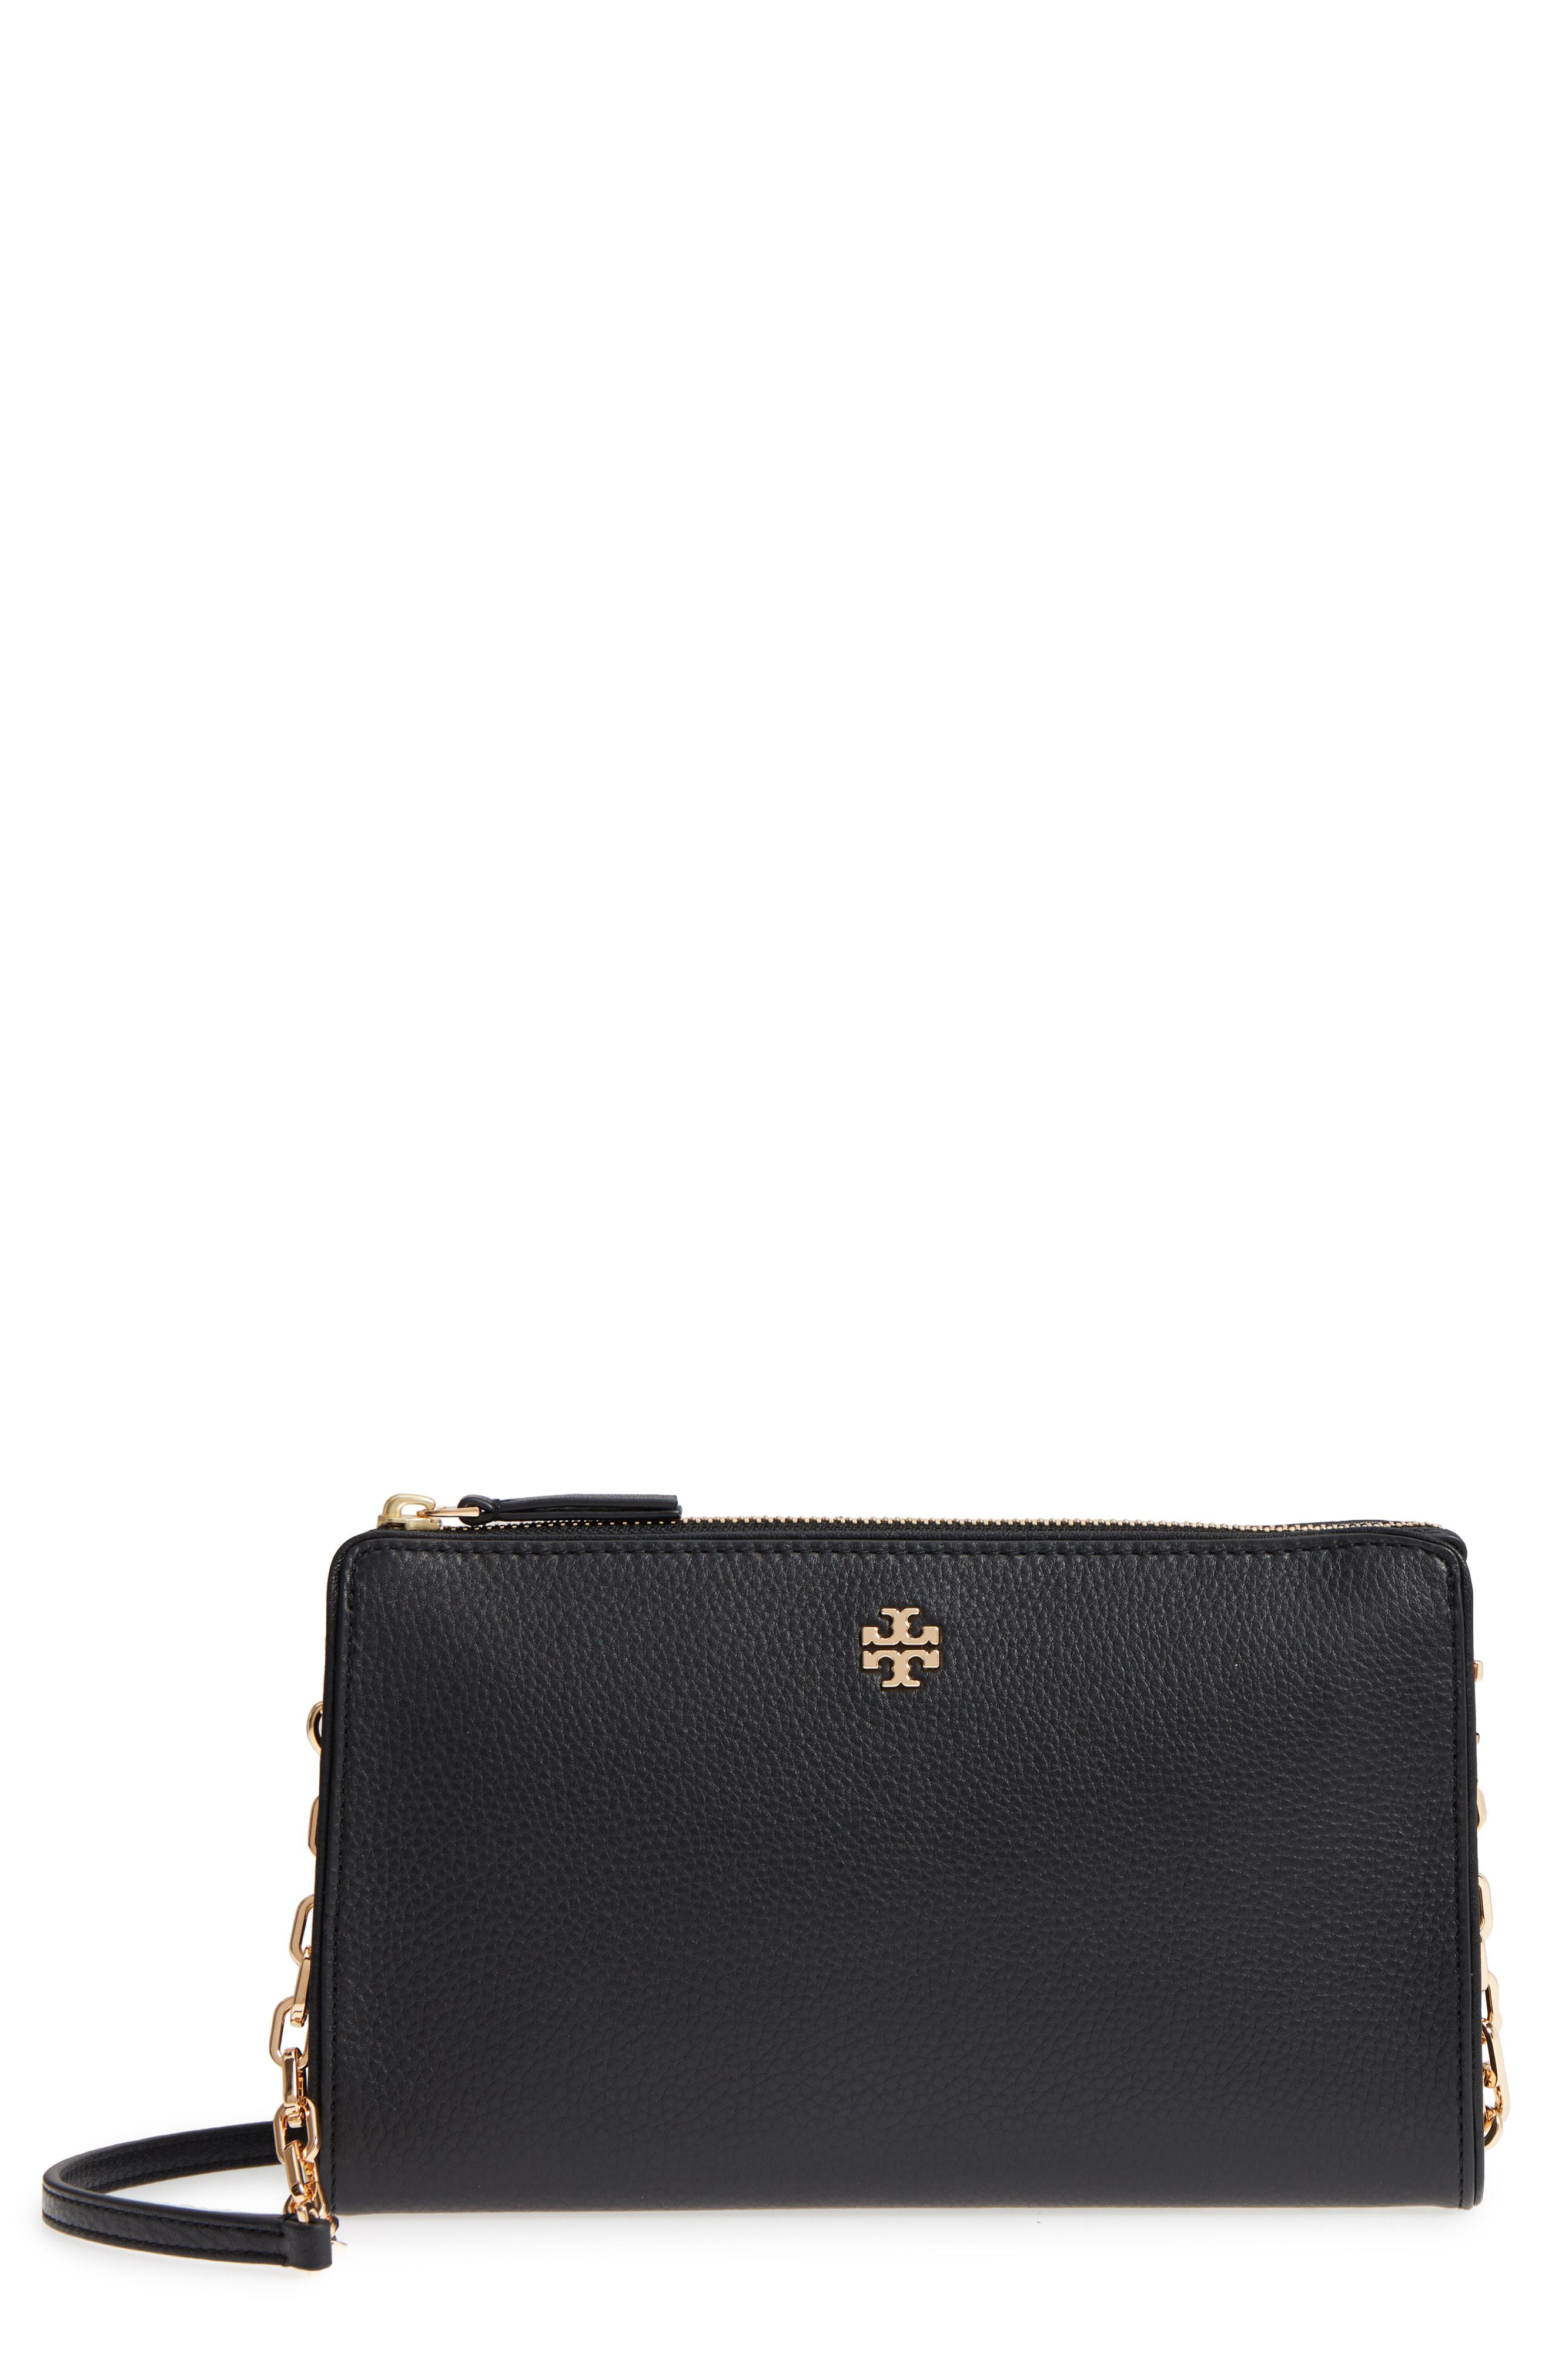 dd890c726c4 Lyst - Tory Burch Marsden Leather Wallet Crossbody Bag in Black